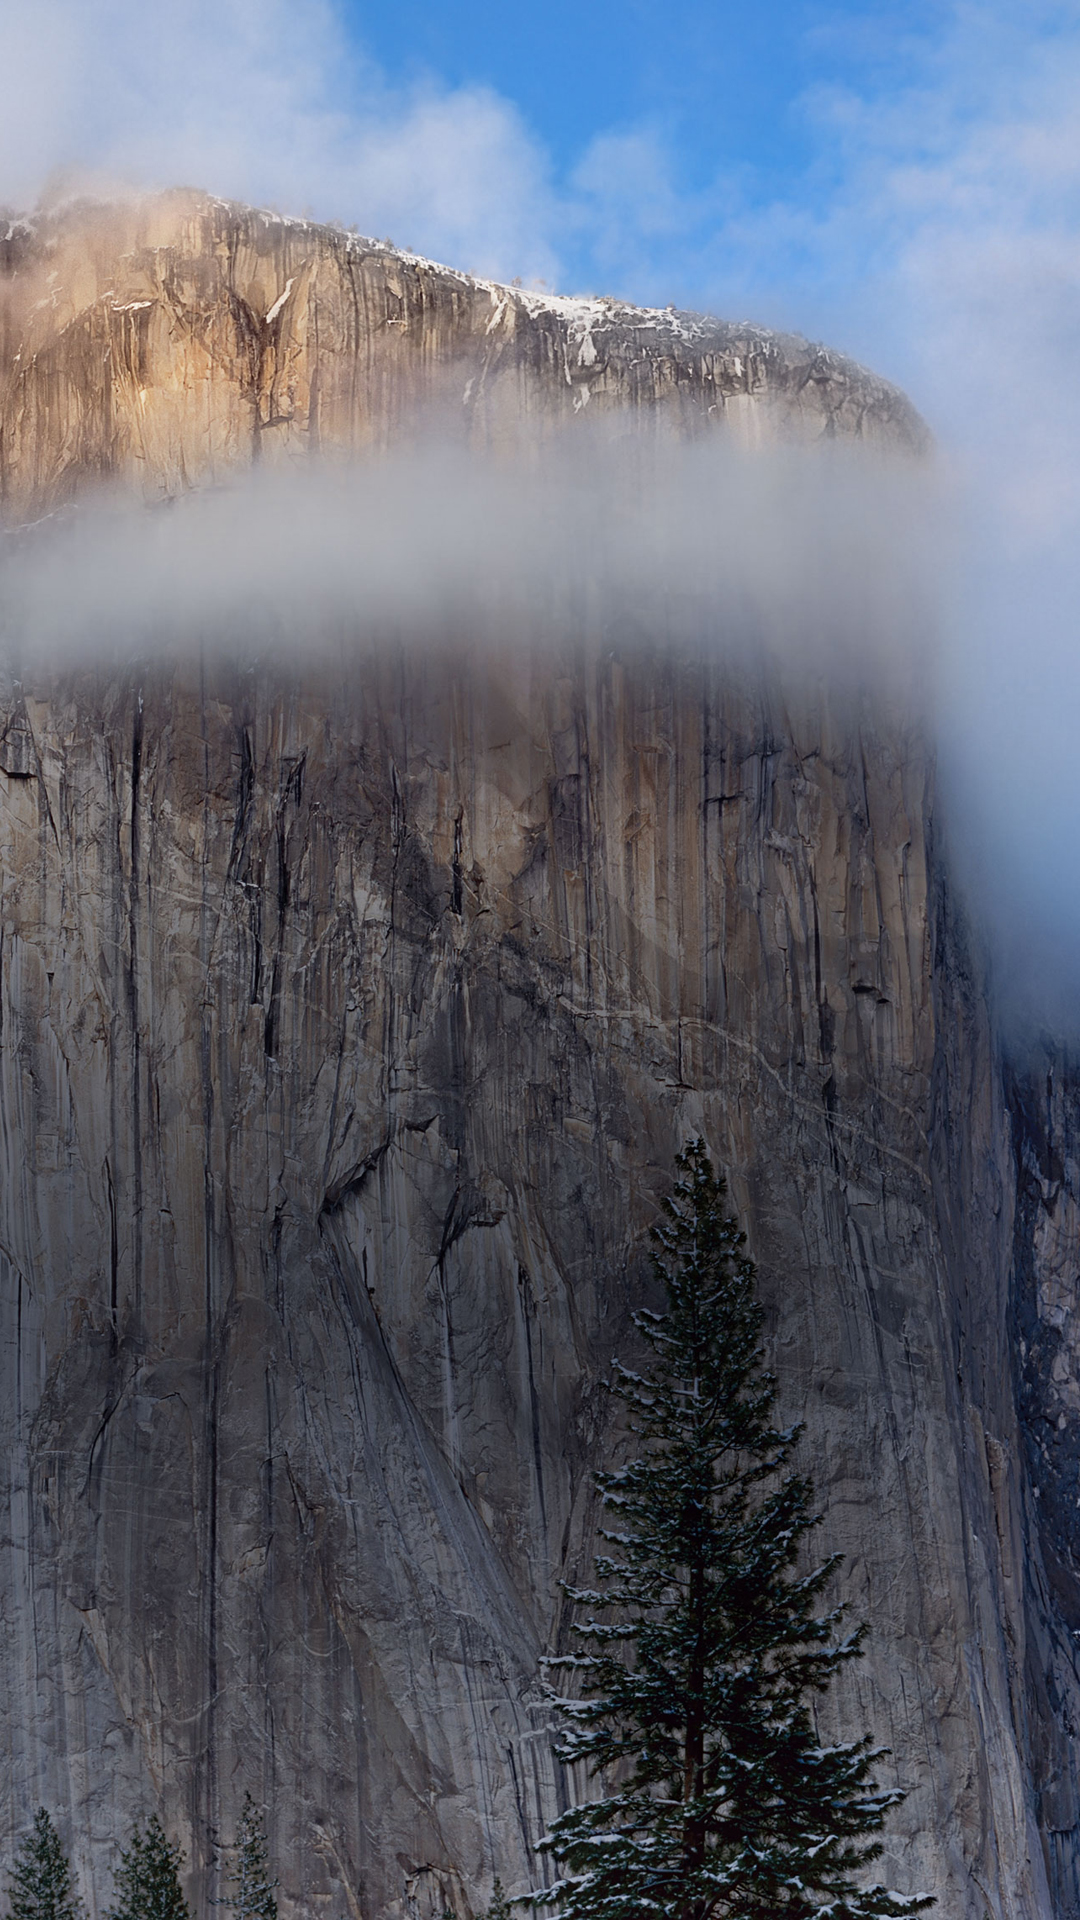 Iphone wallpaper os x yosemite - Mac Osx Yosemite Cliff Iphone 6 Plus Hd Wallpaper Ipod Wallpaper Hd